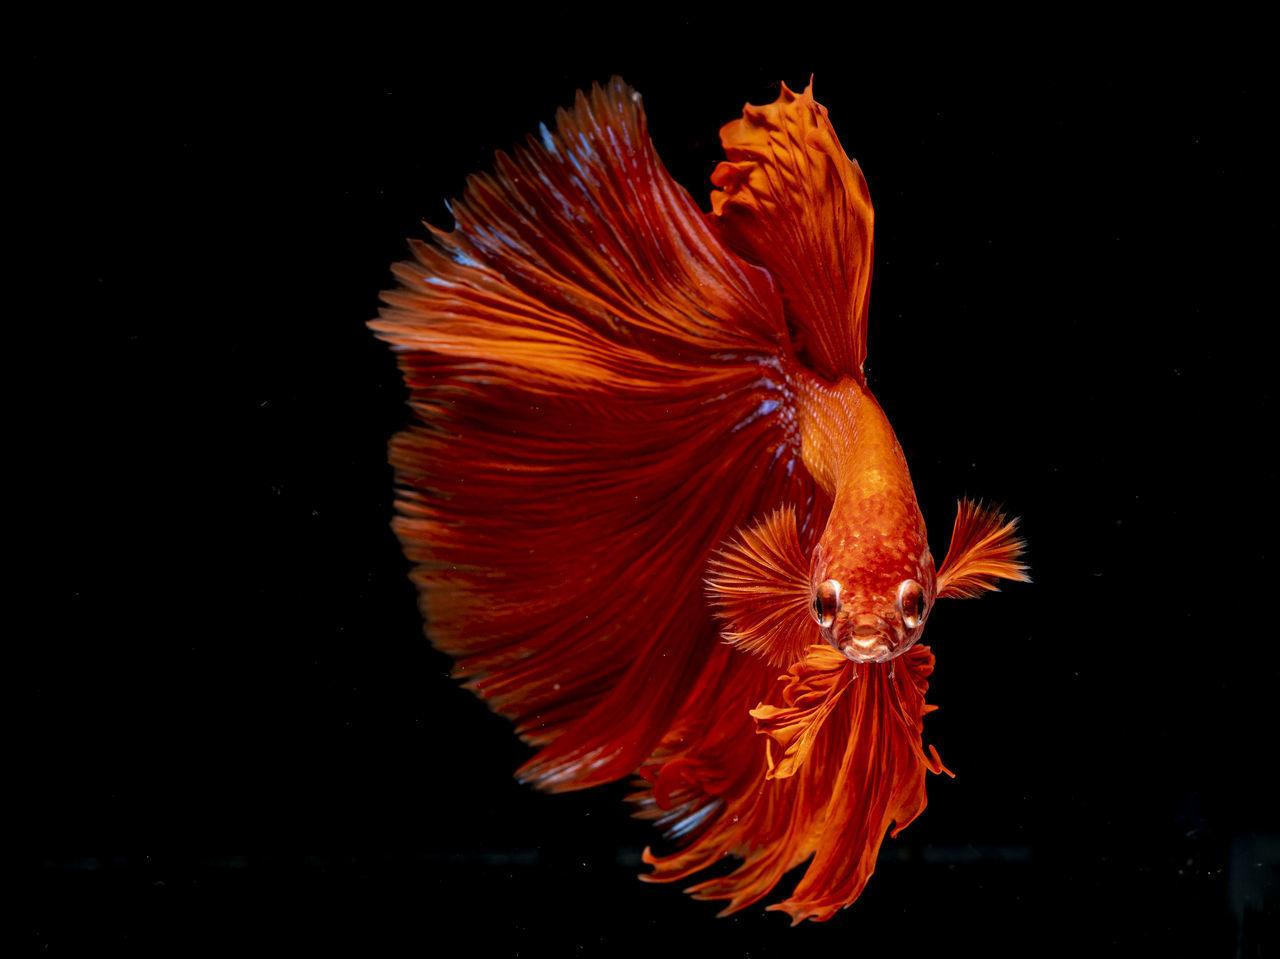 CLOSE-UP OF ORANGE FLOWER IN FISH